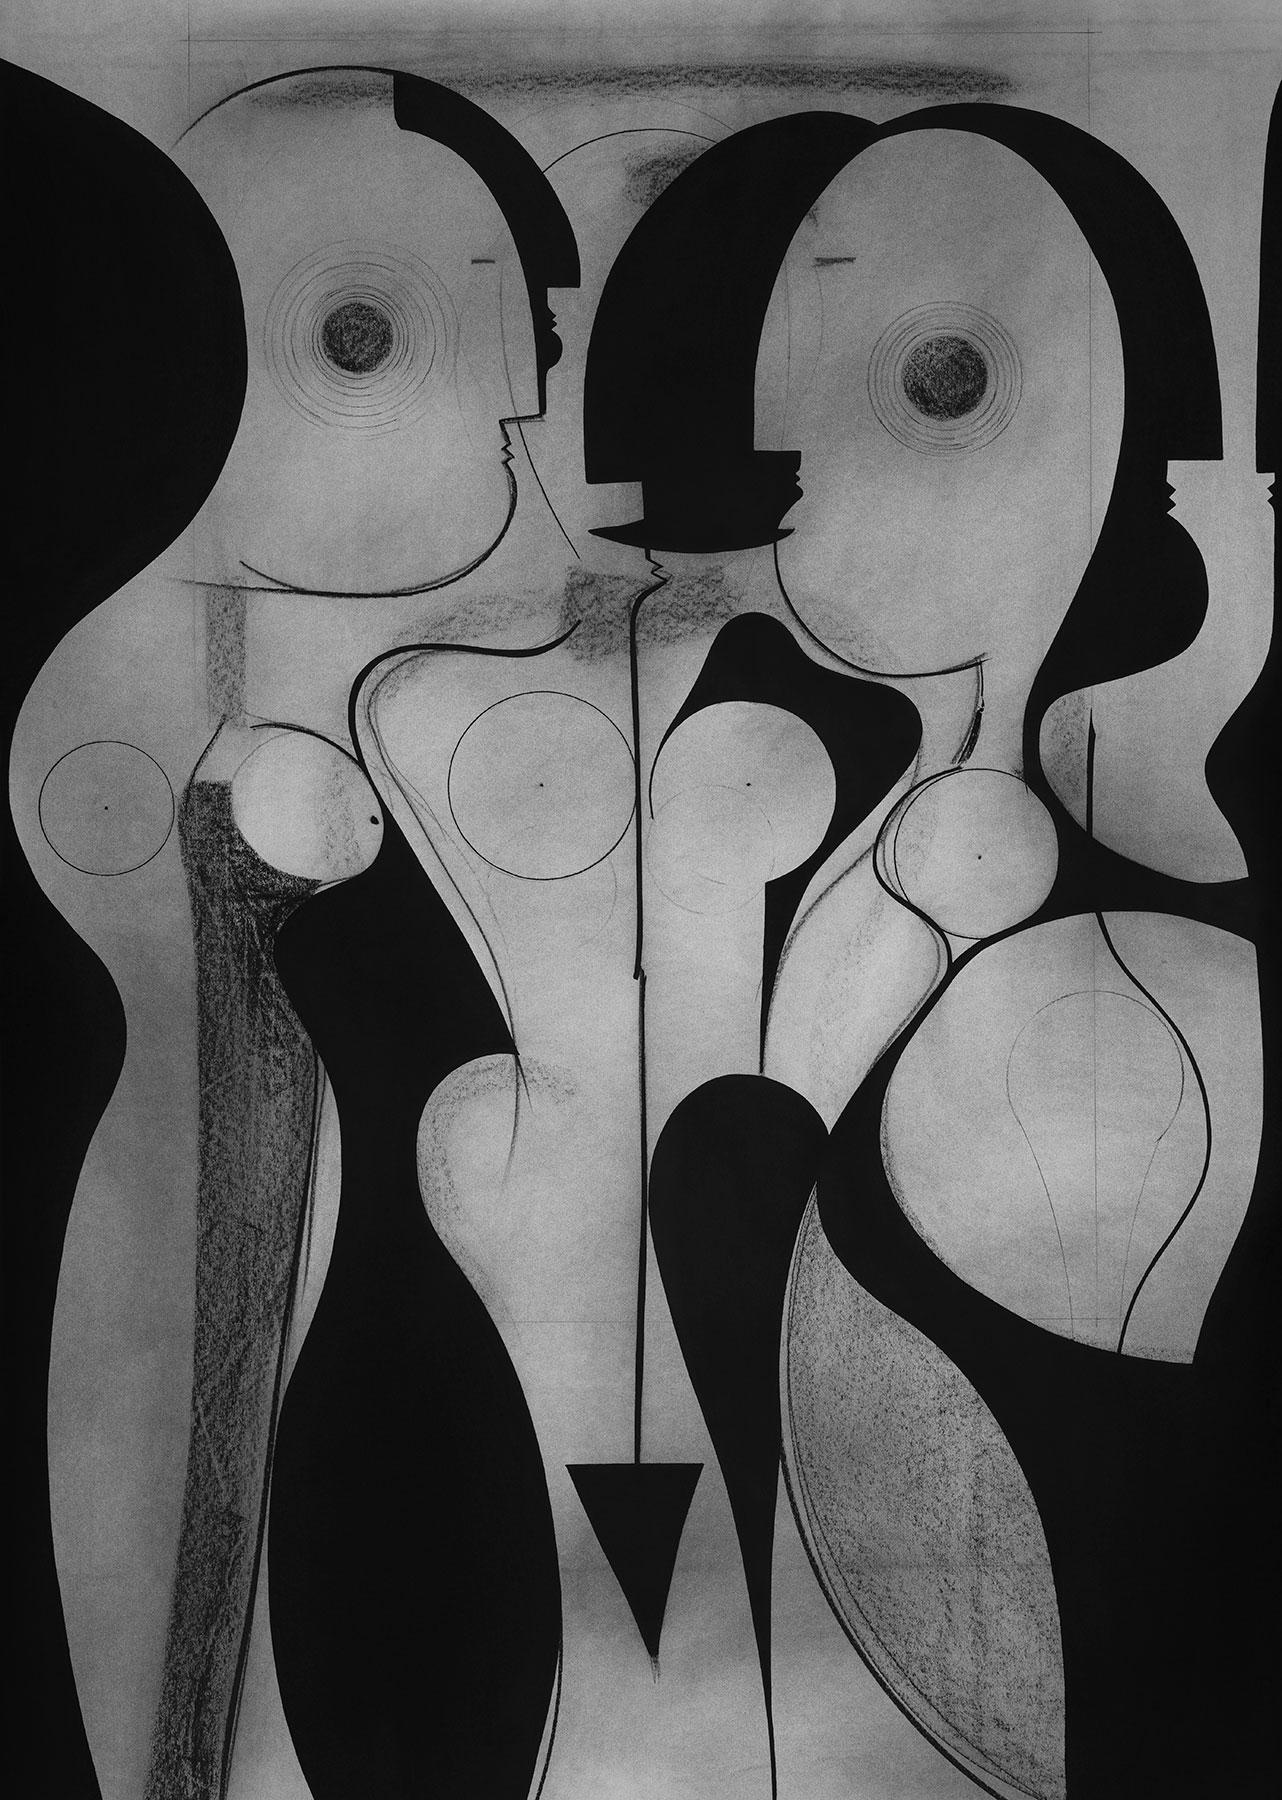 CHARCOAL DRAWING   MARCUS SCHAFER   DARKLIGHT ART